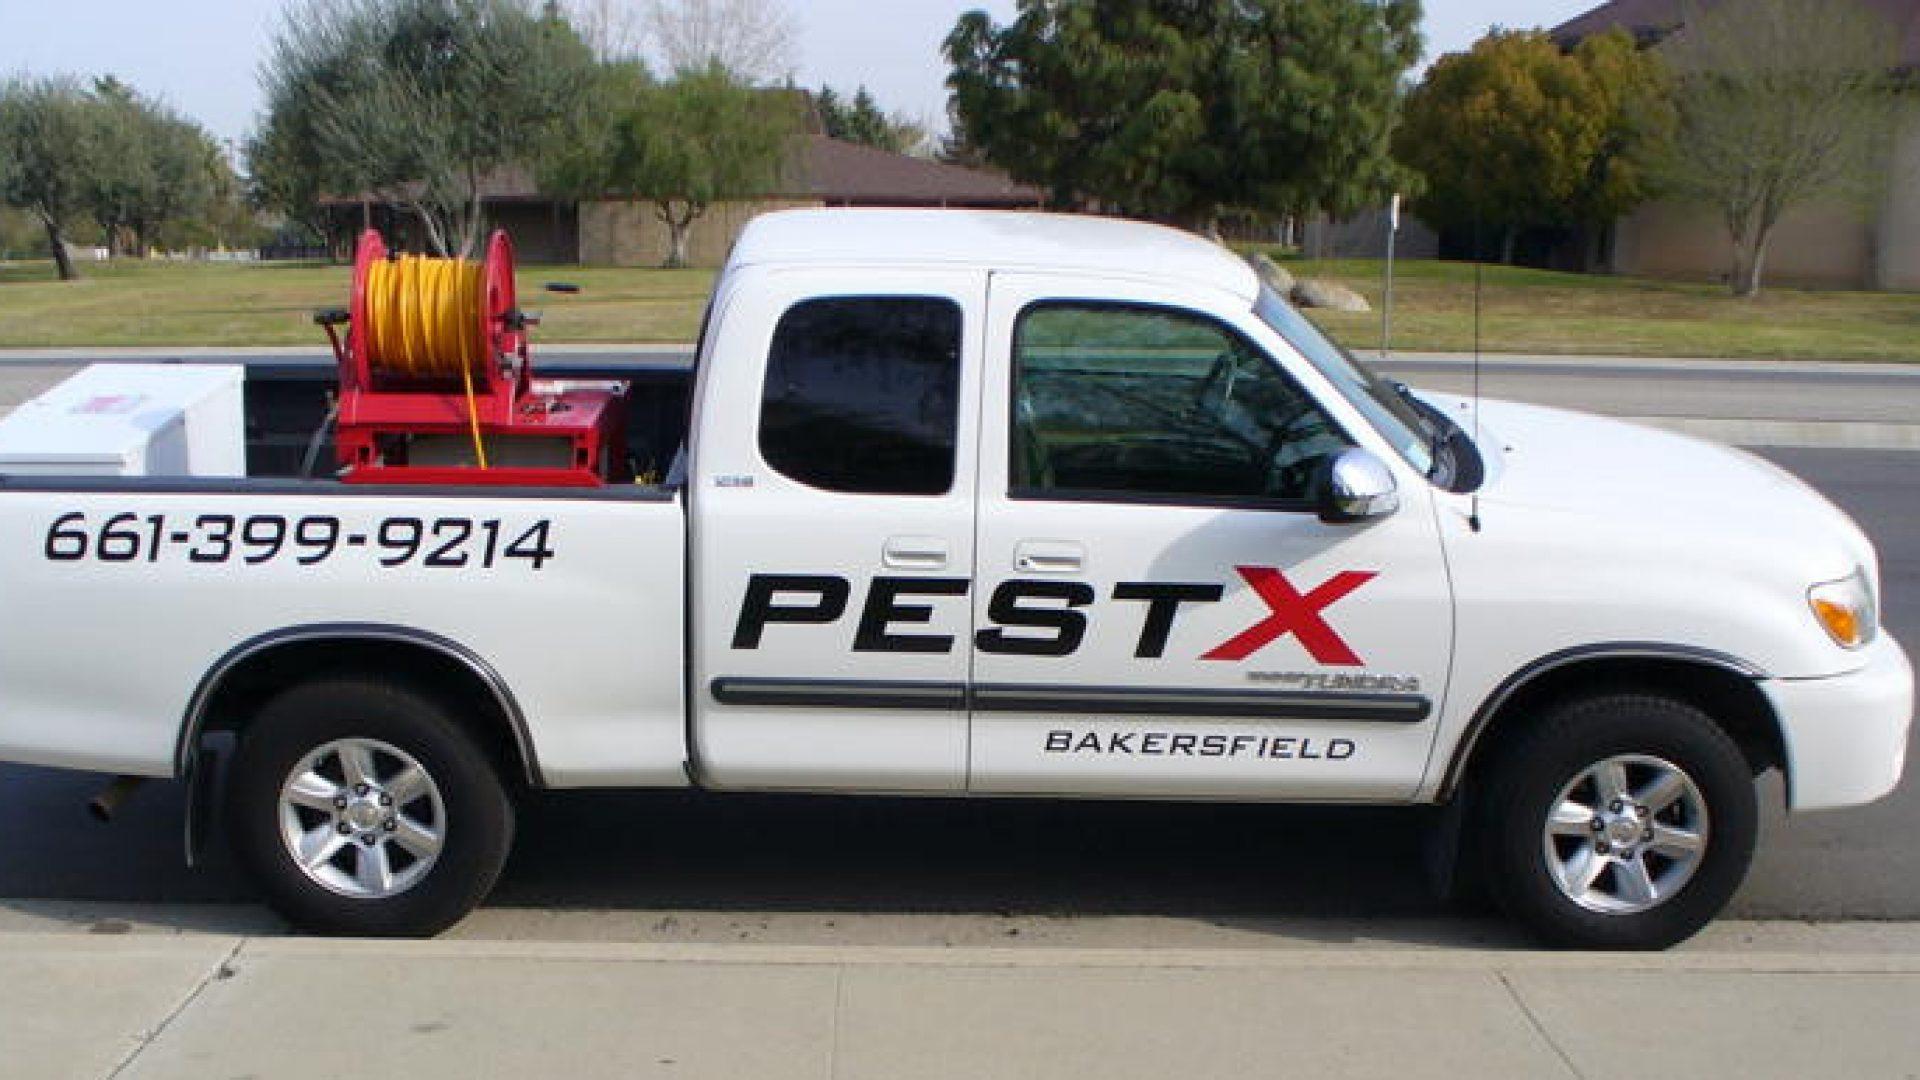 Bakersfield Pest Control, Bakersfield Pest Control Company, PestX